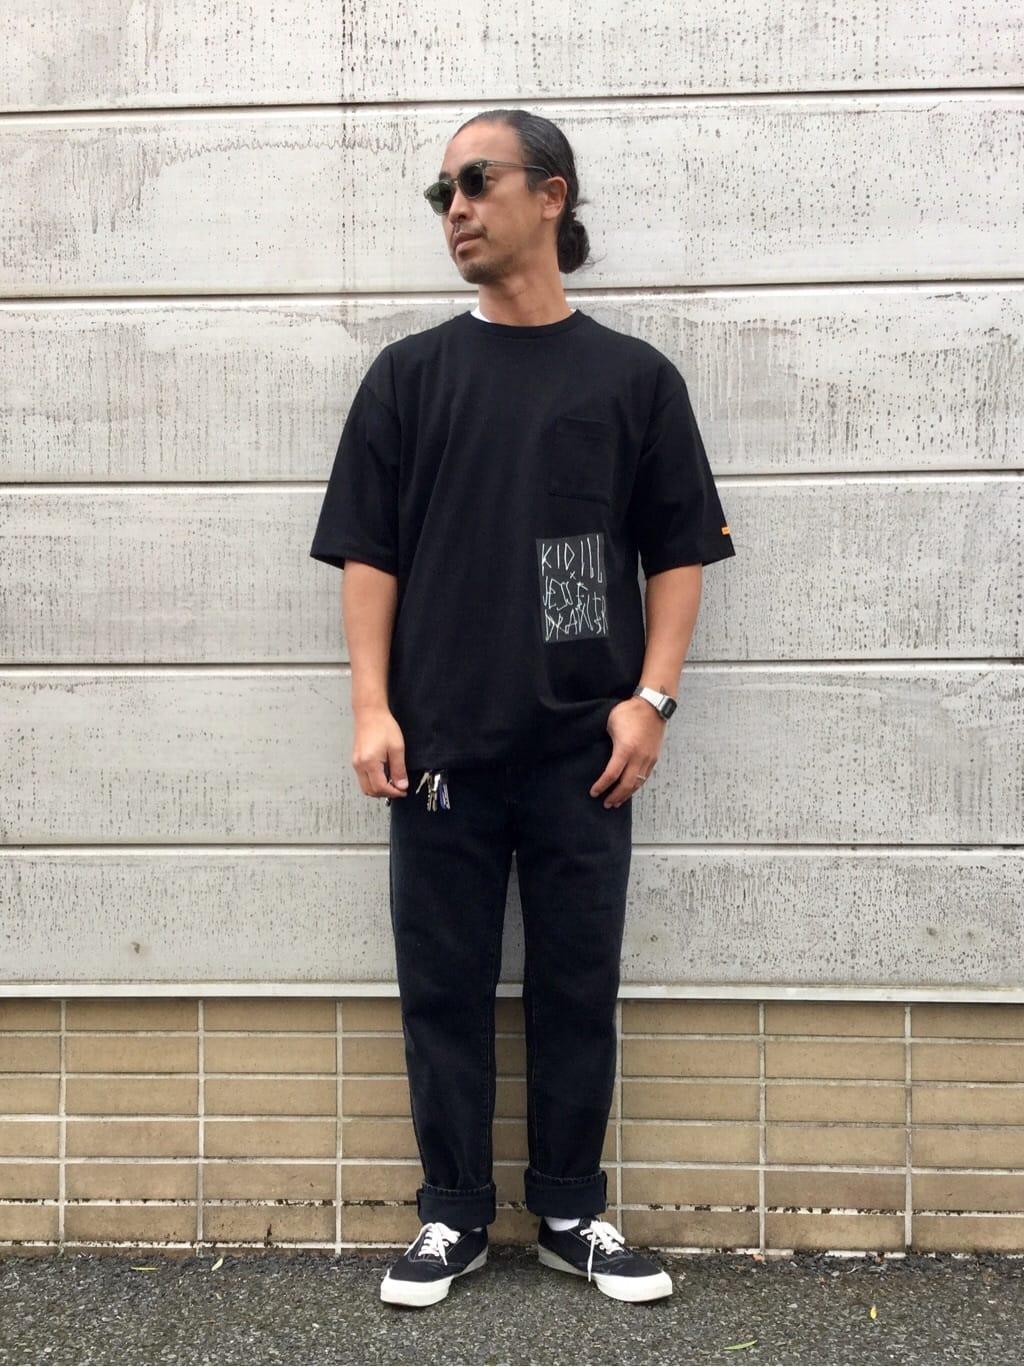 TOKYO HARAJUKU店のKEITAROさんのEDWINの【EDWIN x KIDILL x JESSE DRAXLER】BIGFIT T SHIRT PT2を使ったコーディネート